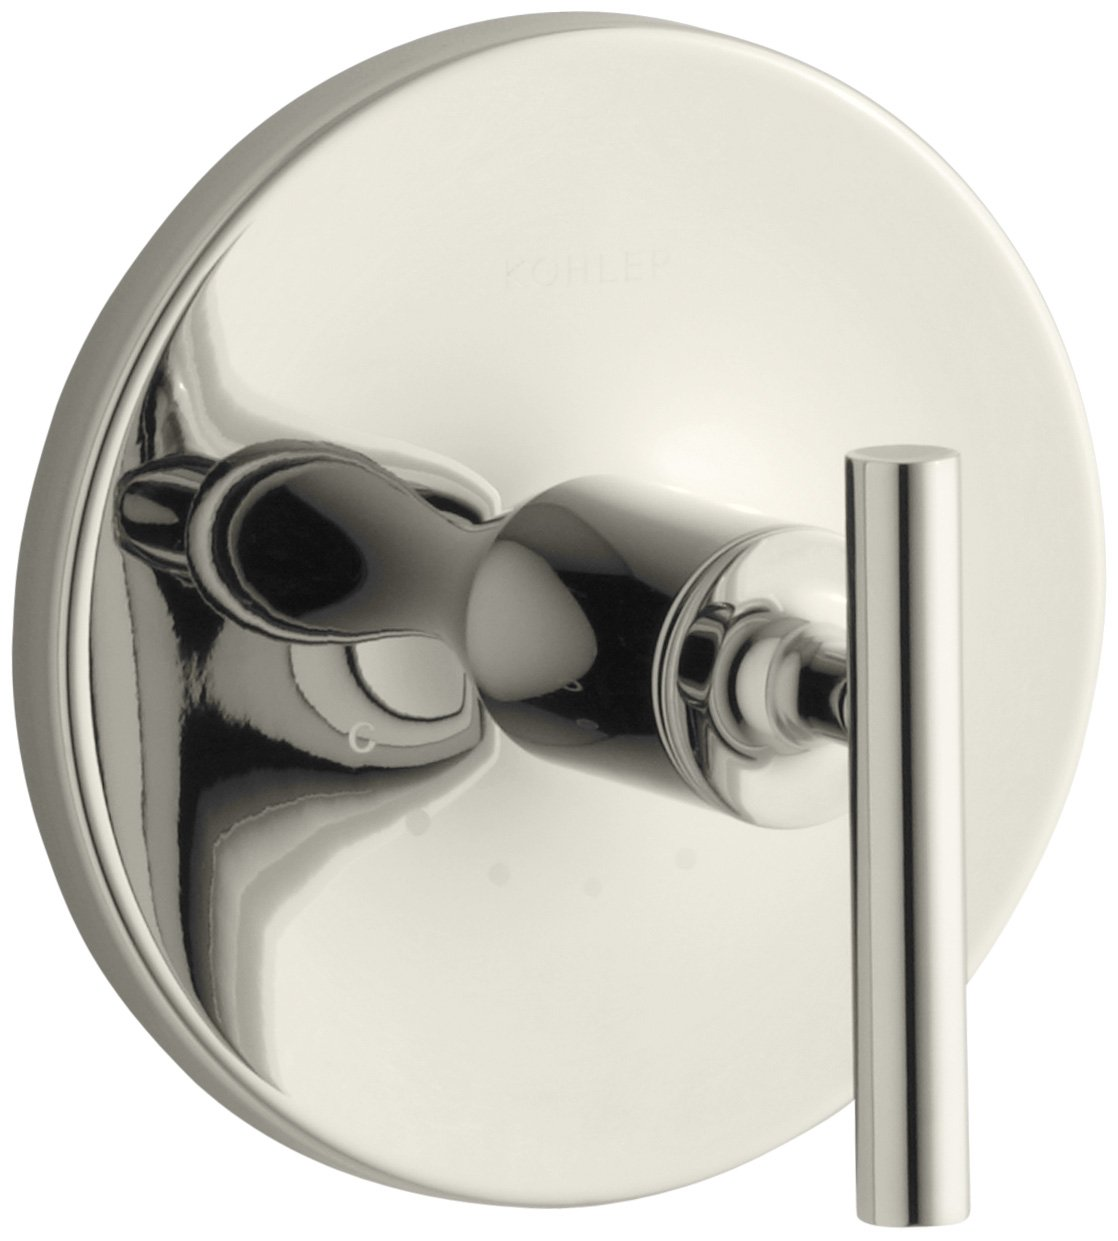 kohler kt144884cp purist valve trim polished chrome faucet handles amazoncom - Kohler Purist